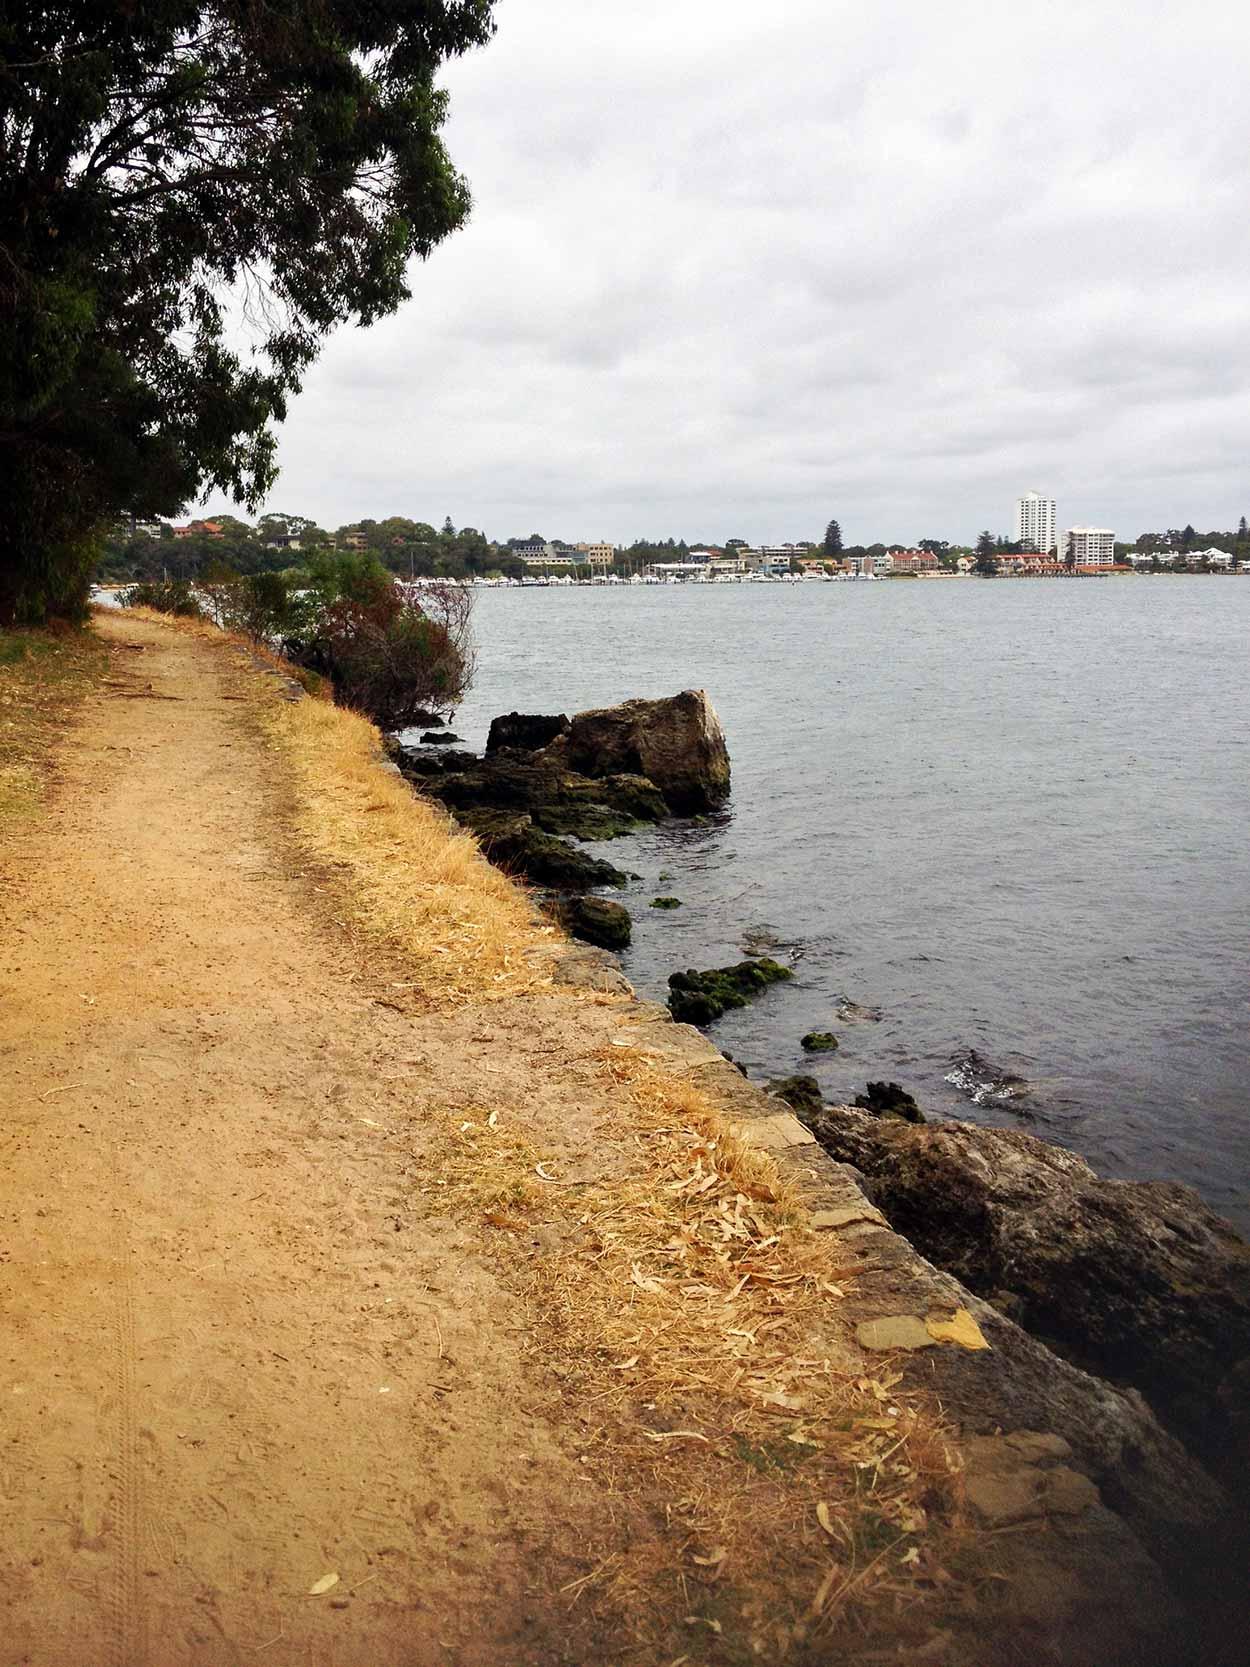 Strolling along a gravel path next to Karrakatta Bank, Swan River, Perth, Western Australia